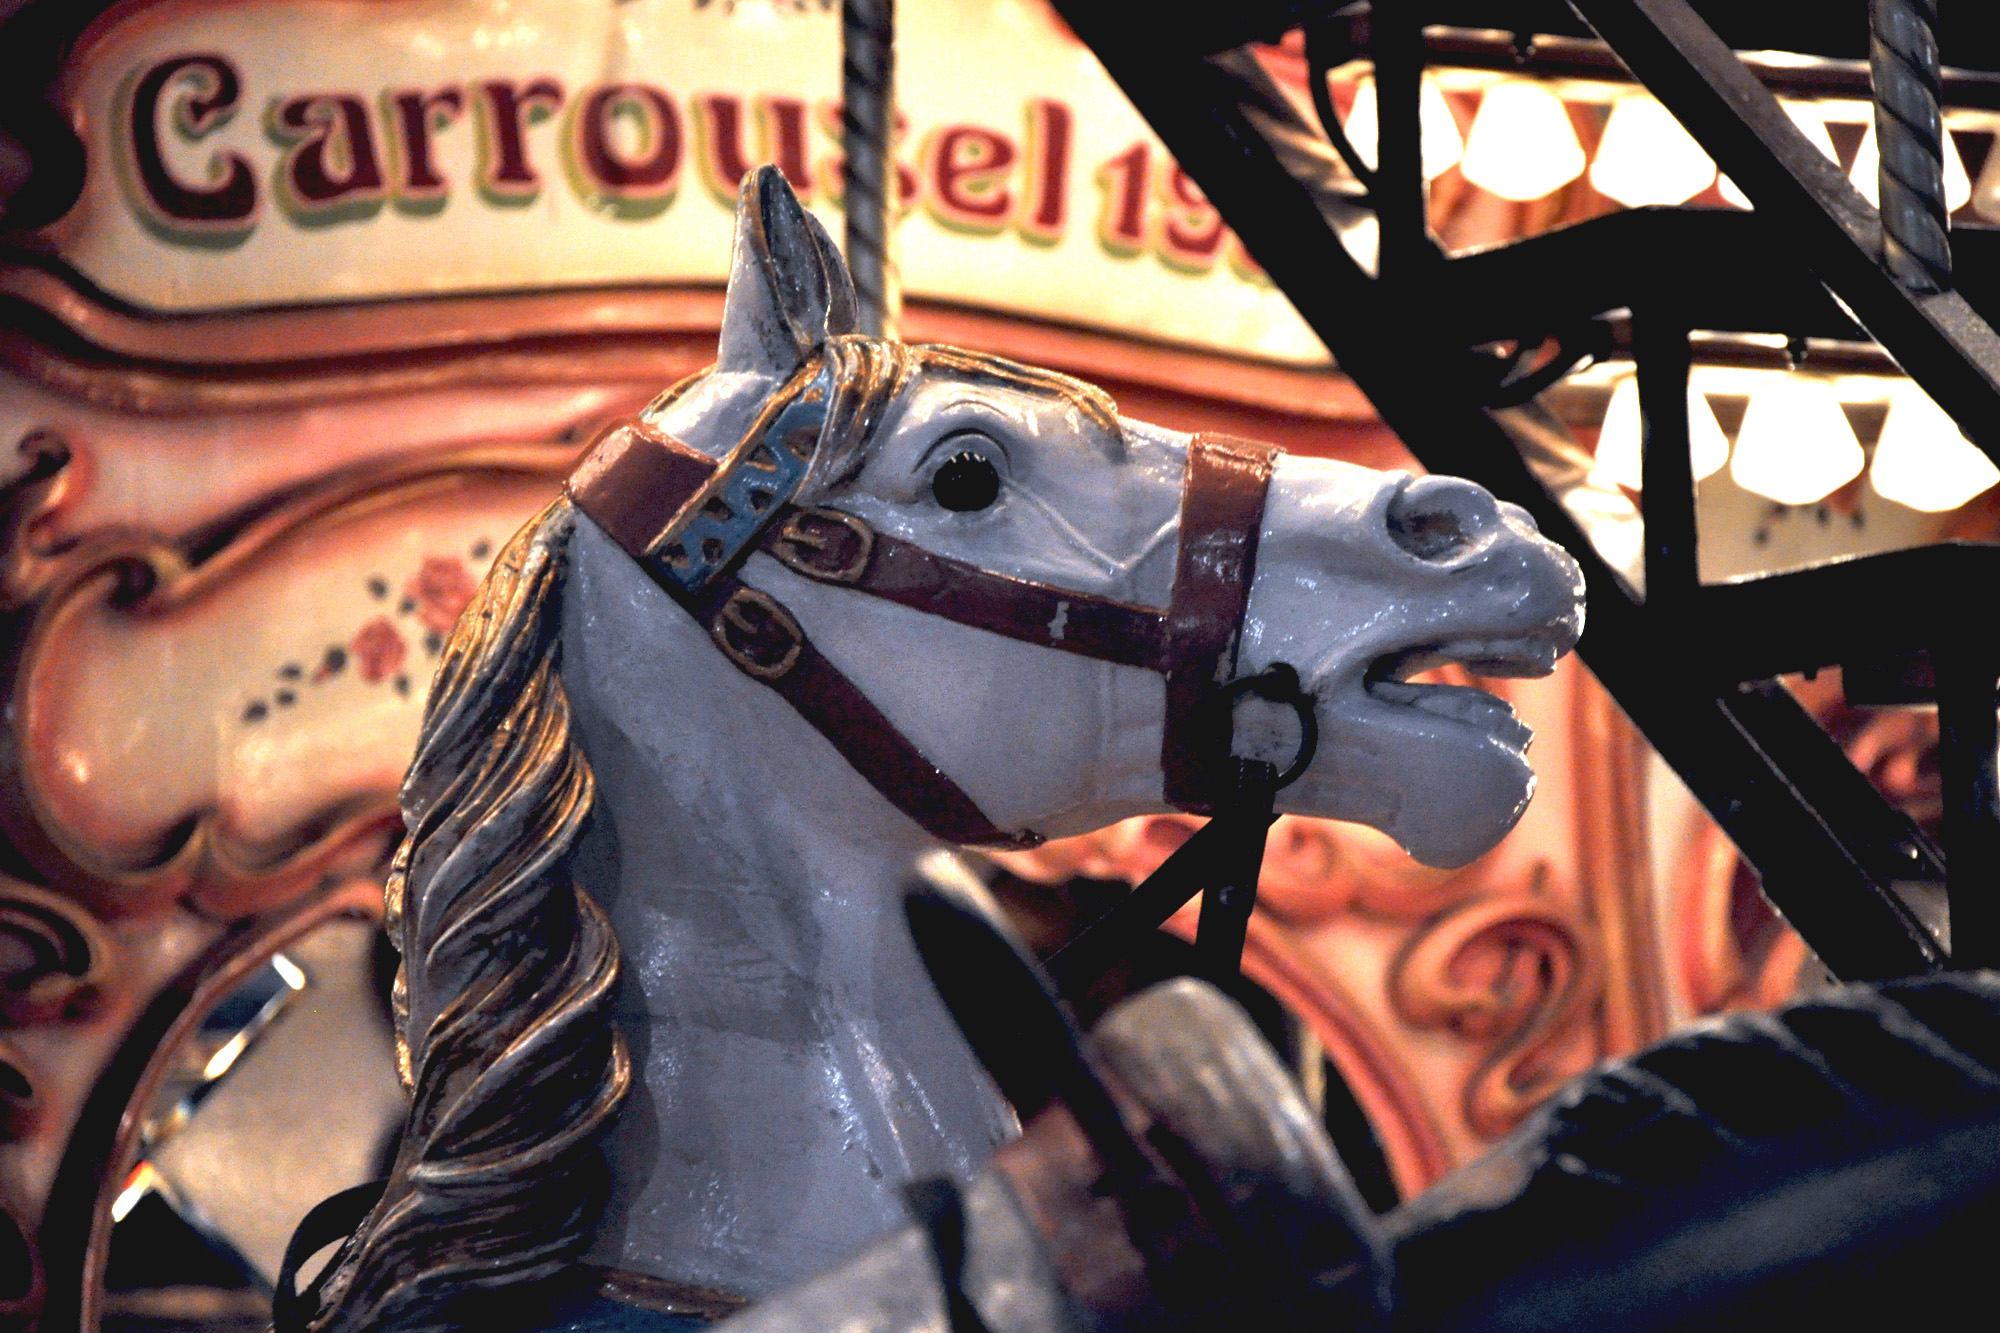 Carrousel small.jpg